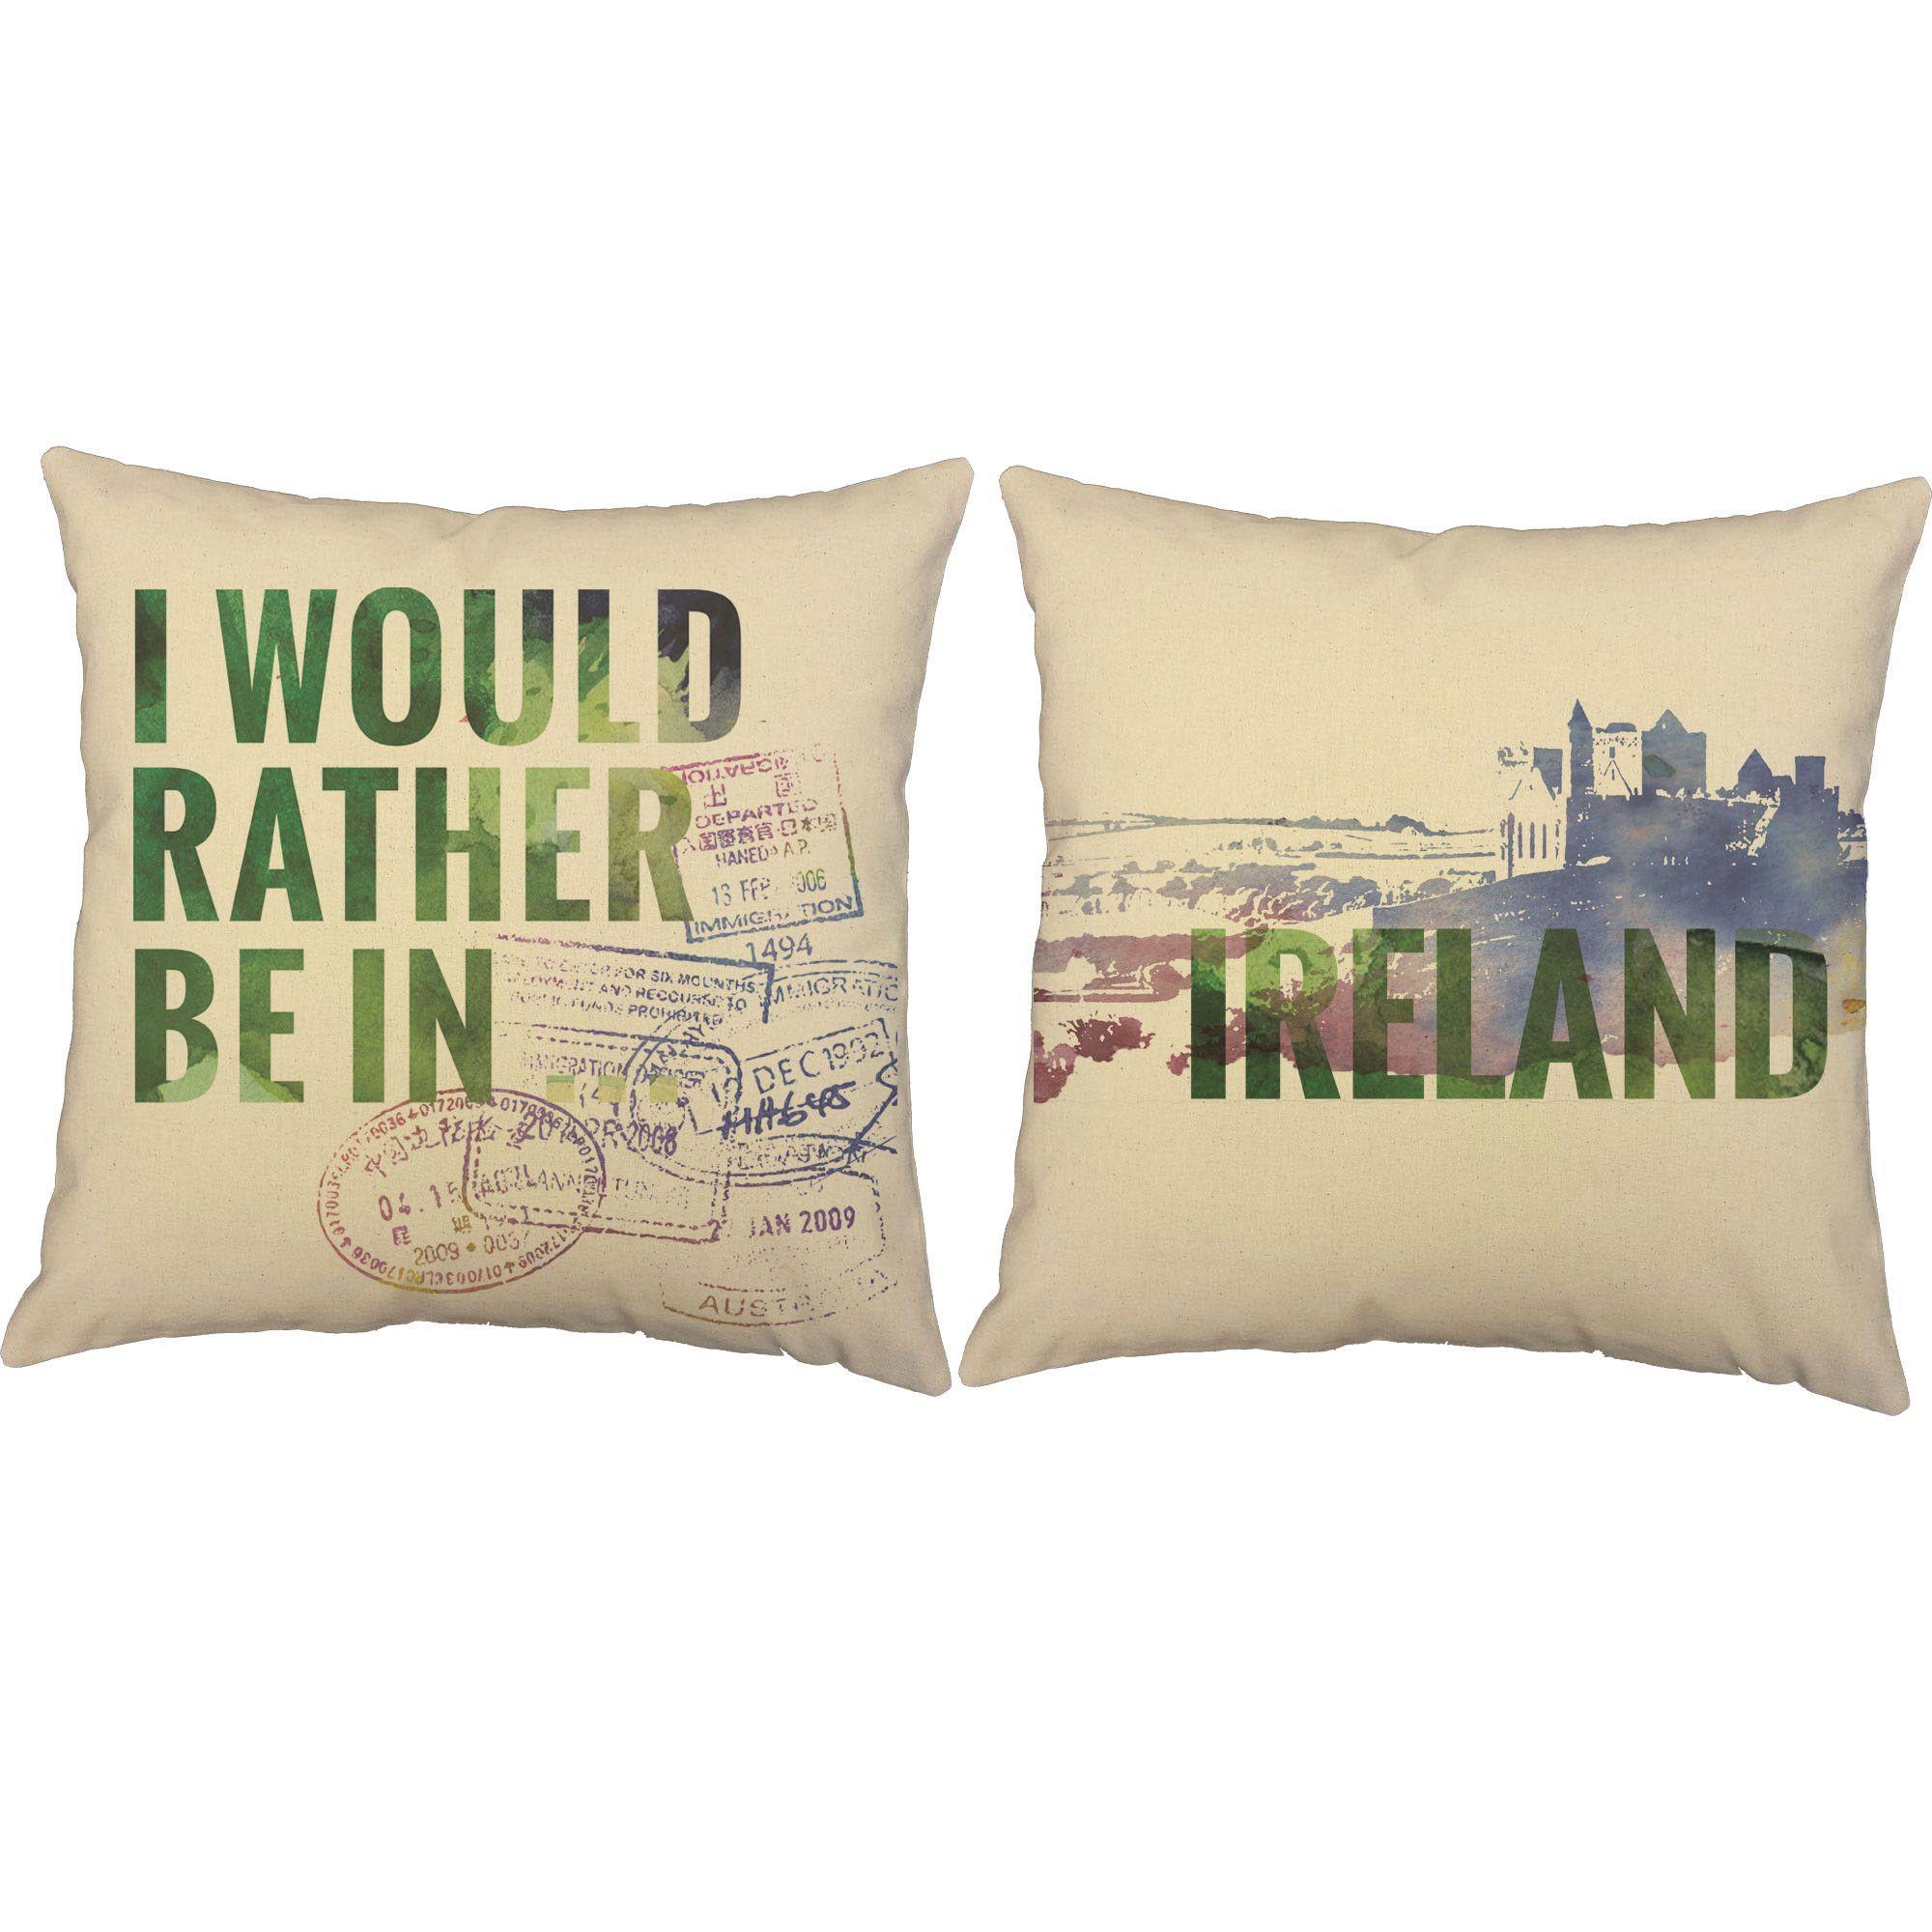 Rather be in ireland throw pillows pinterest throw pillow sets